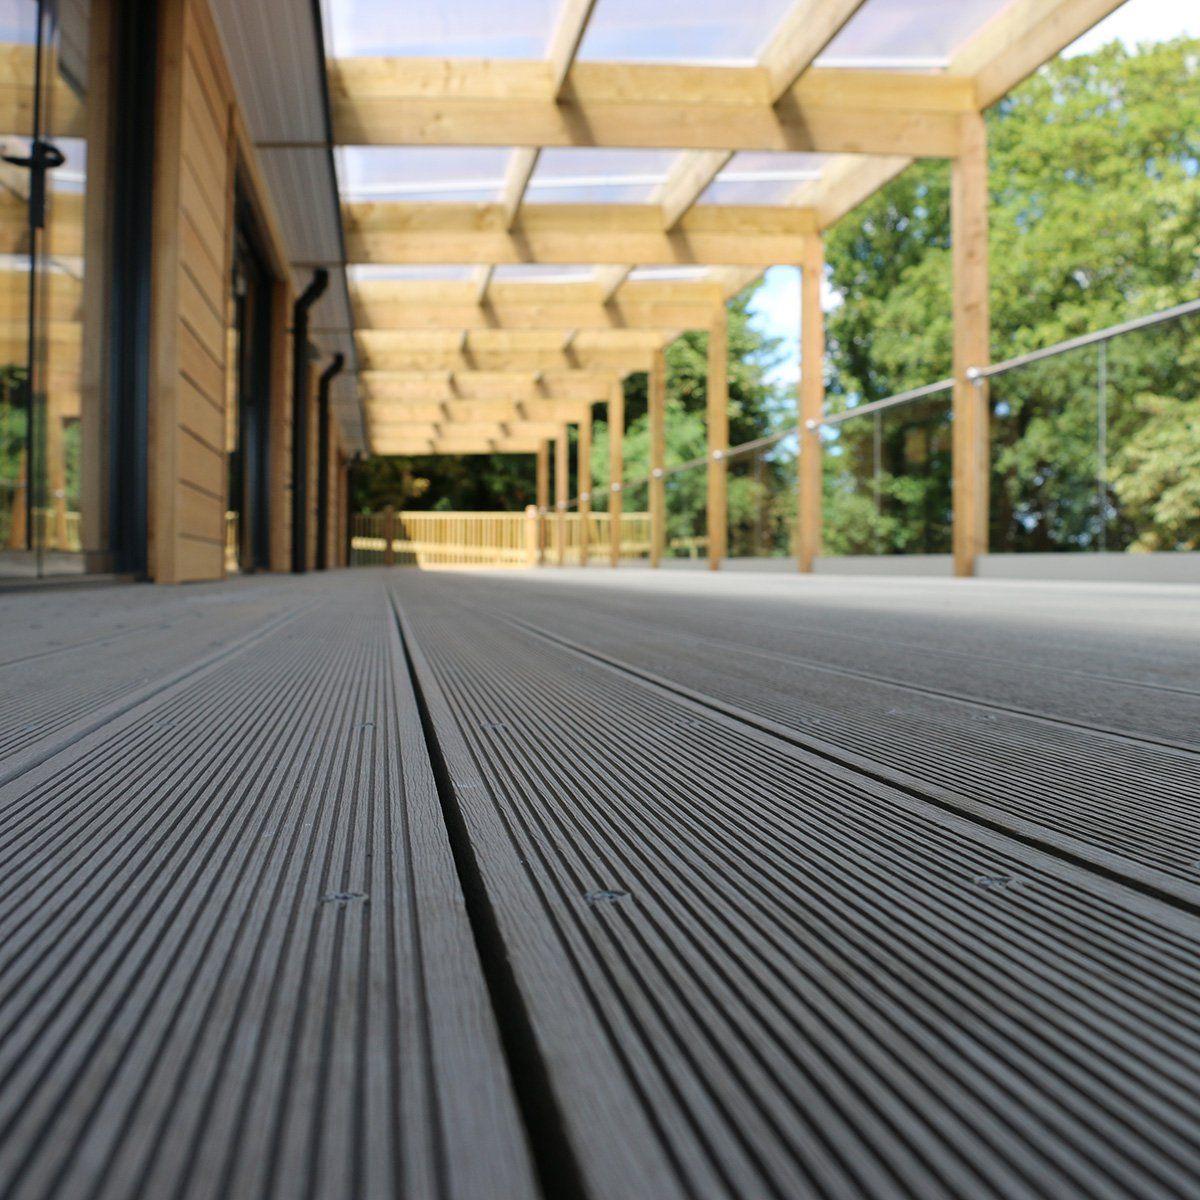 Cheap wood plastic floor suppliers decking pinterest outdoor waterproofingfireproofingdurable wood plastic deck shanghai seven trust company baanklon Images